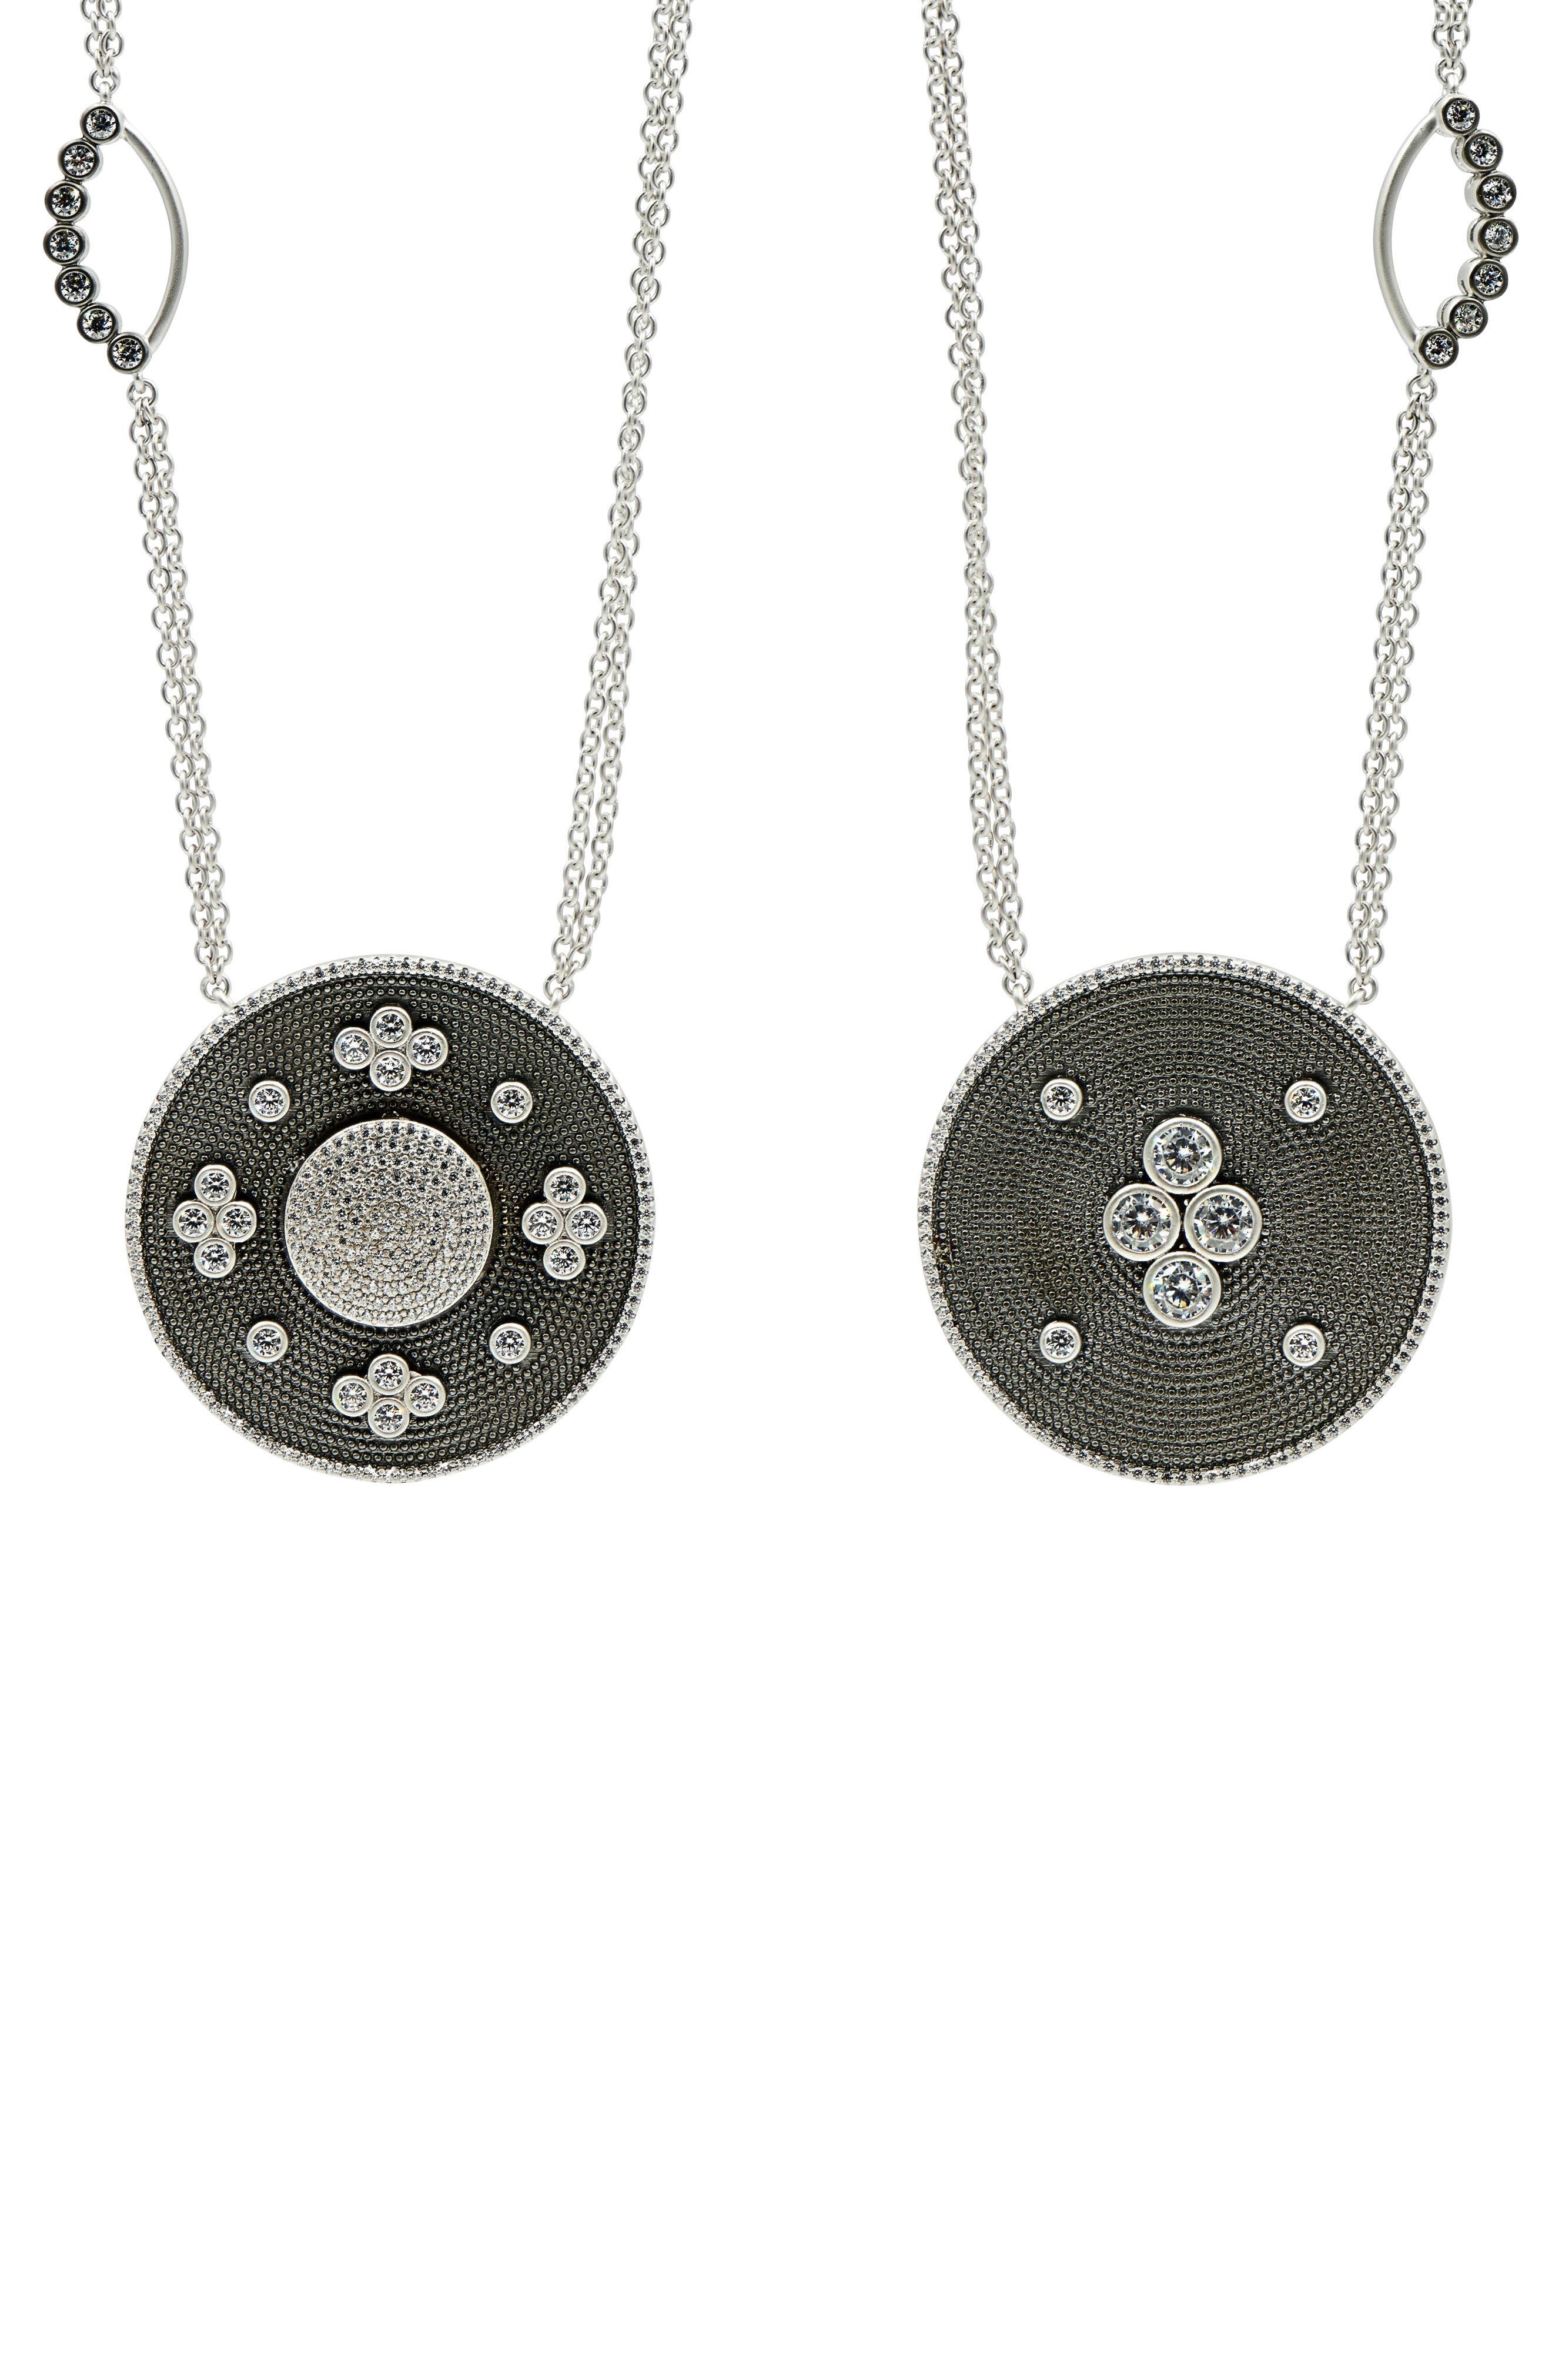 Industrial Finish Pendant Necklace,                             Alternate thumbnail 4, color,                             BLACK/ SILVER